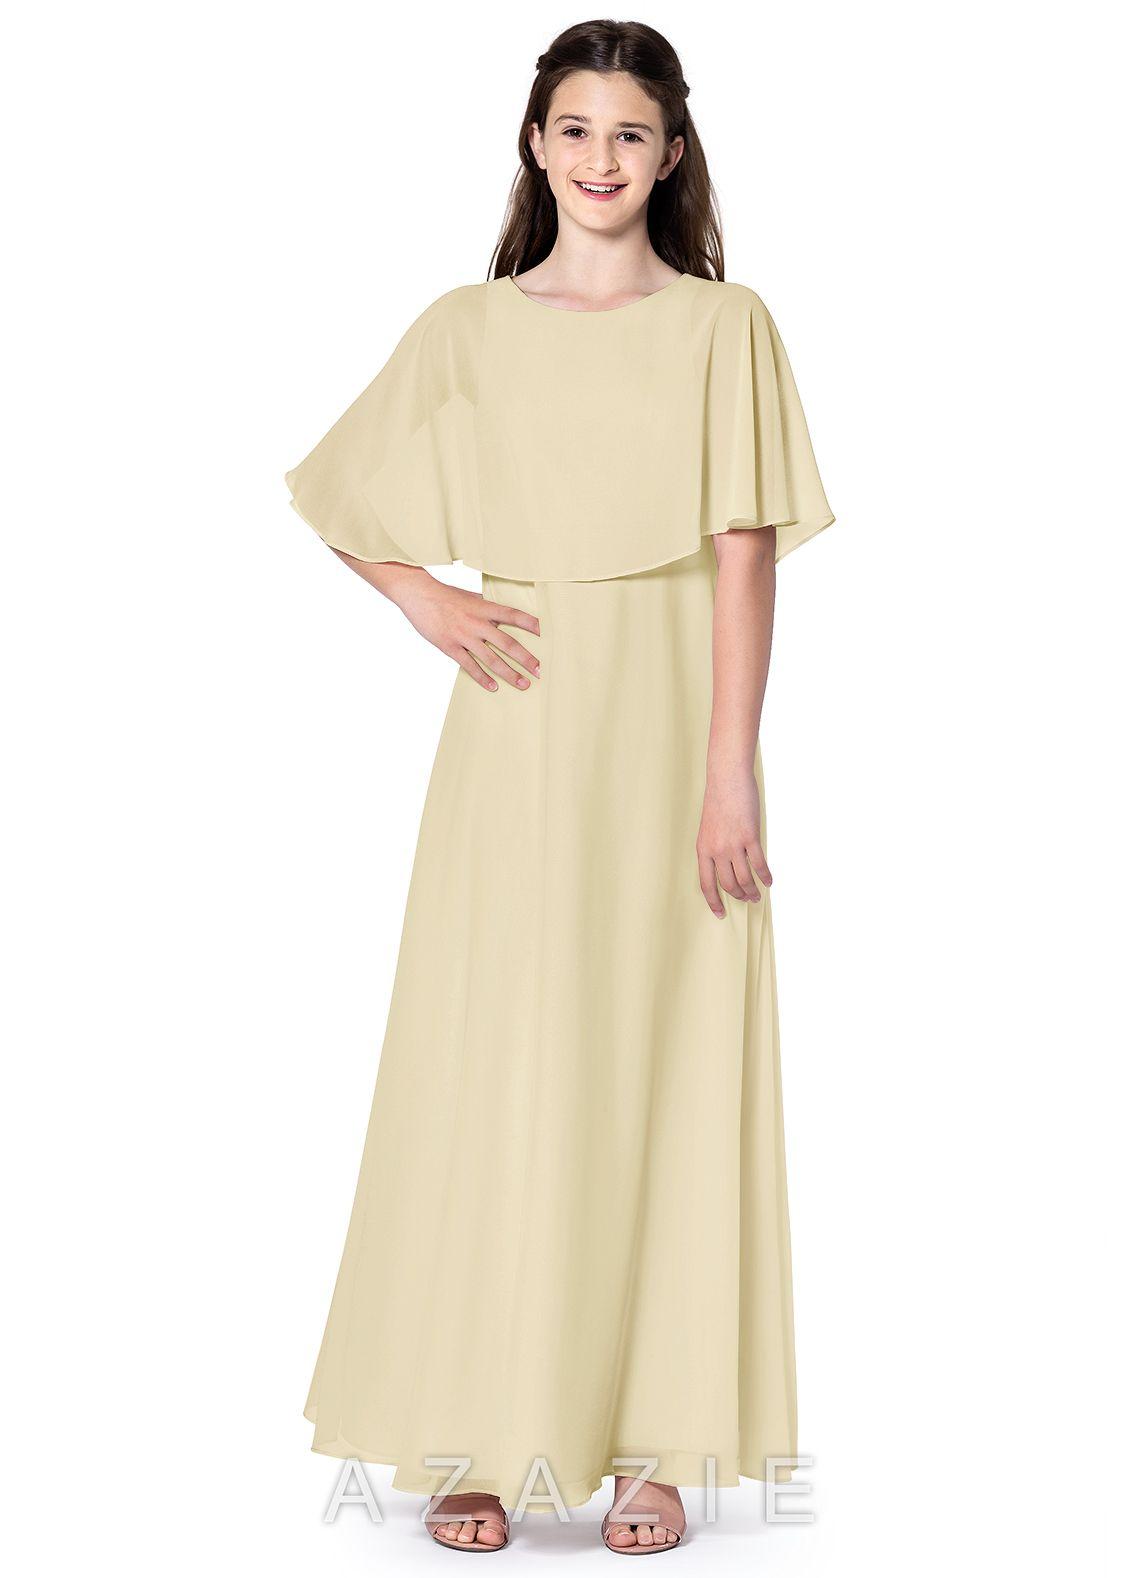 61cbd0f3f0a Ivory Junior Bridesmaid Dresses - Gomes Weine AG